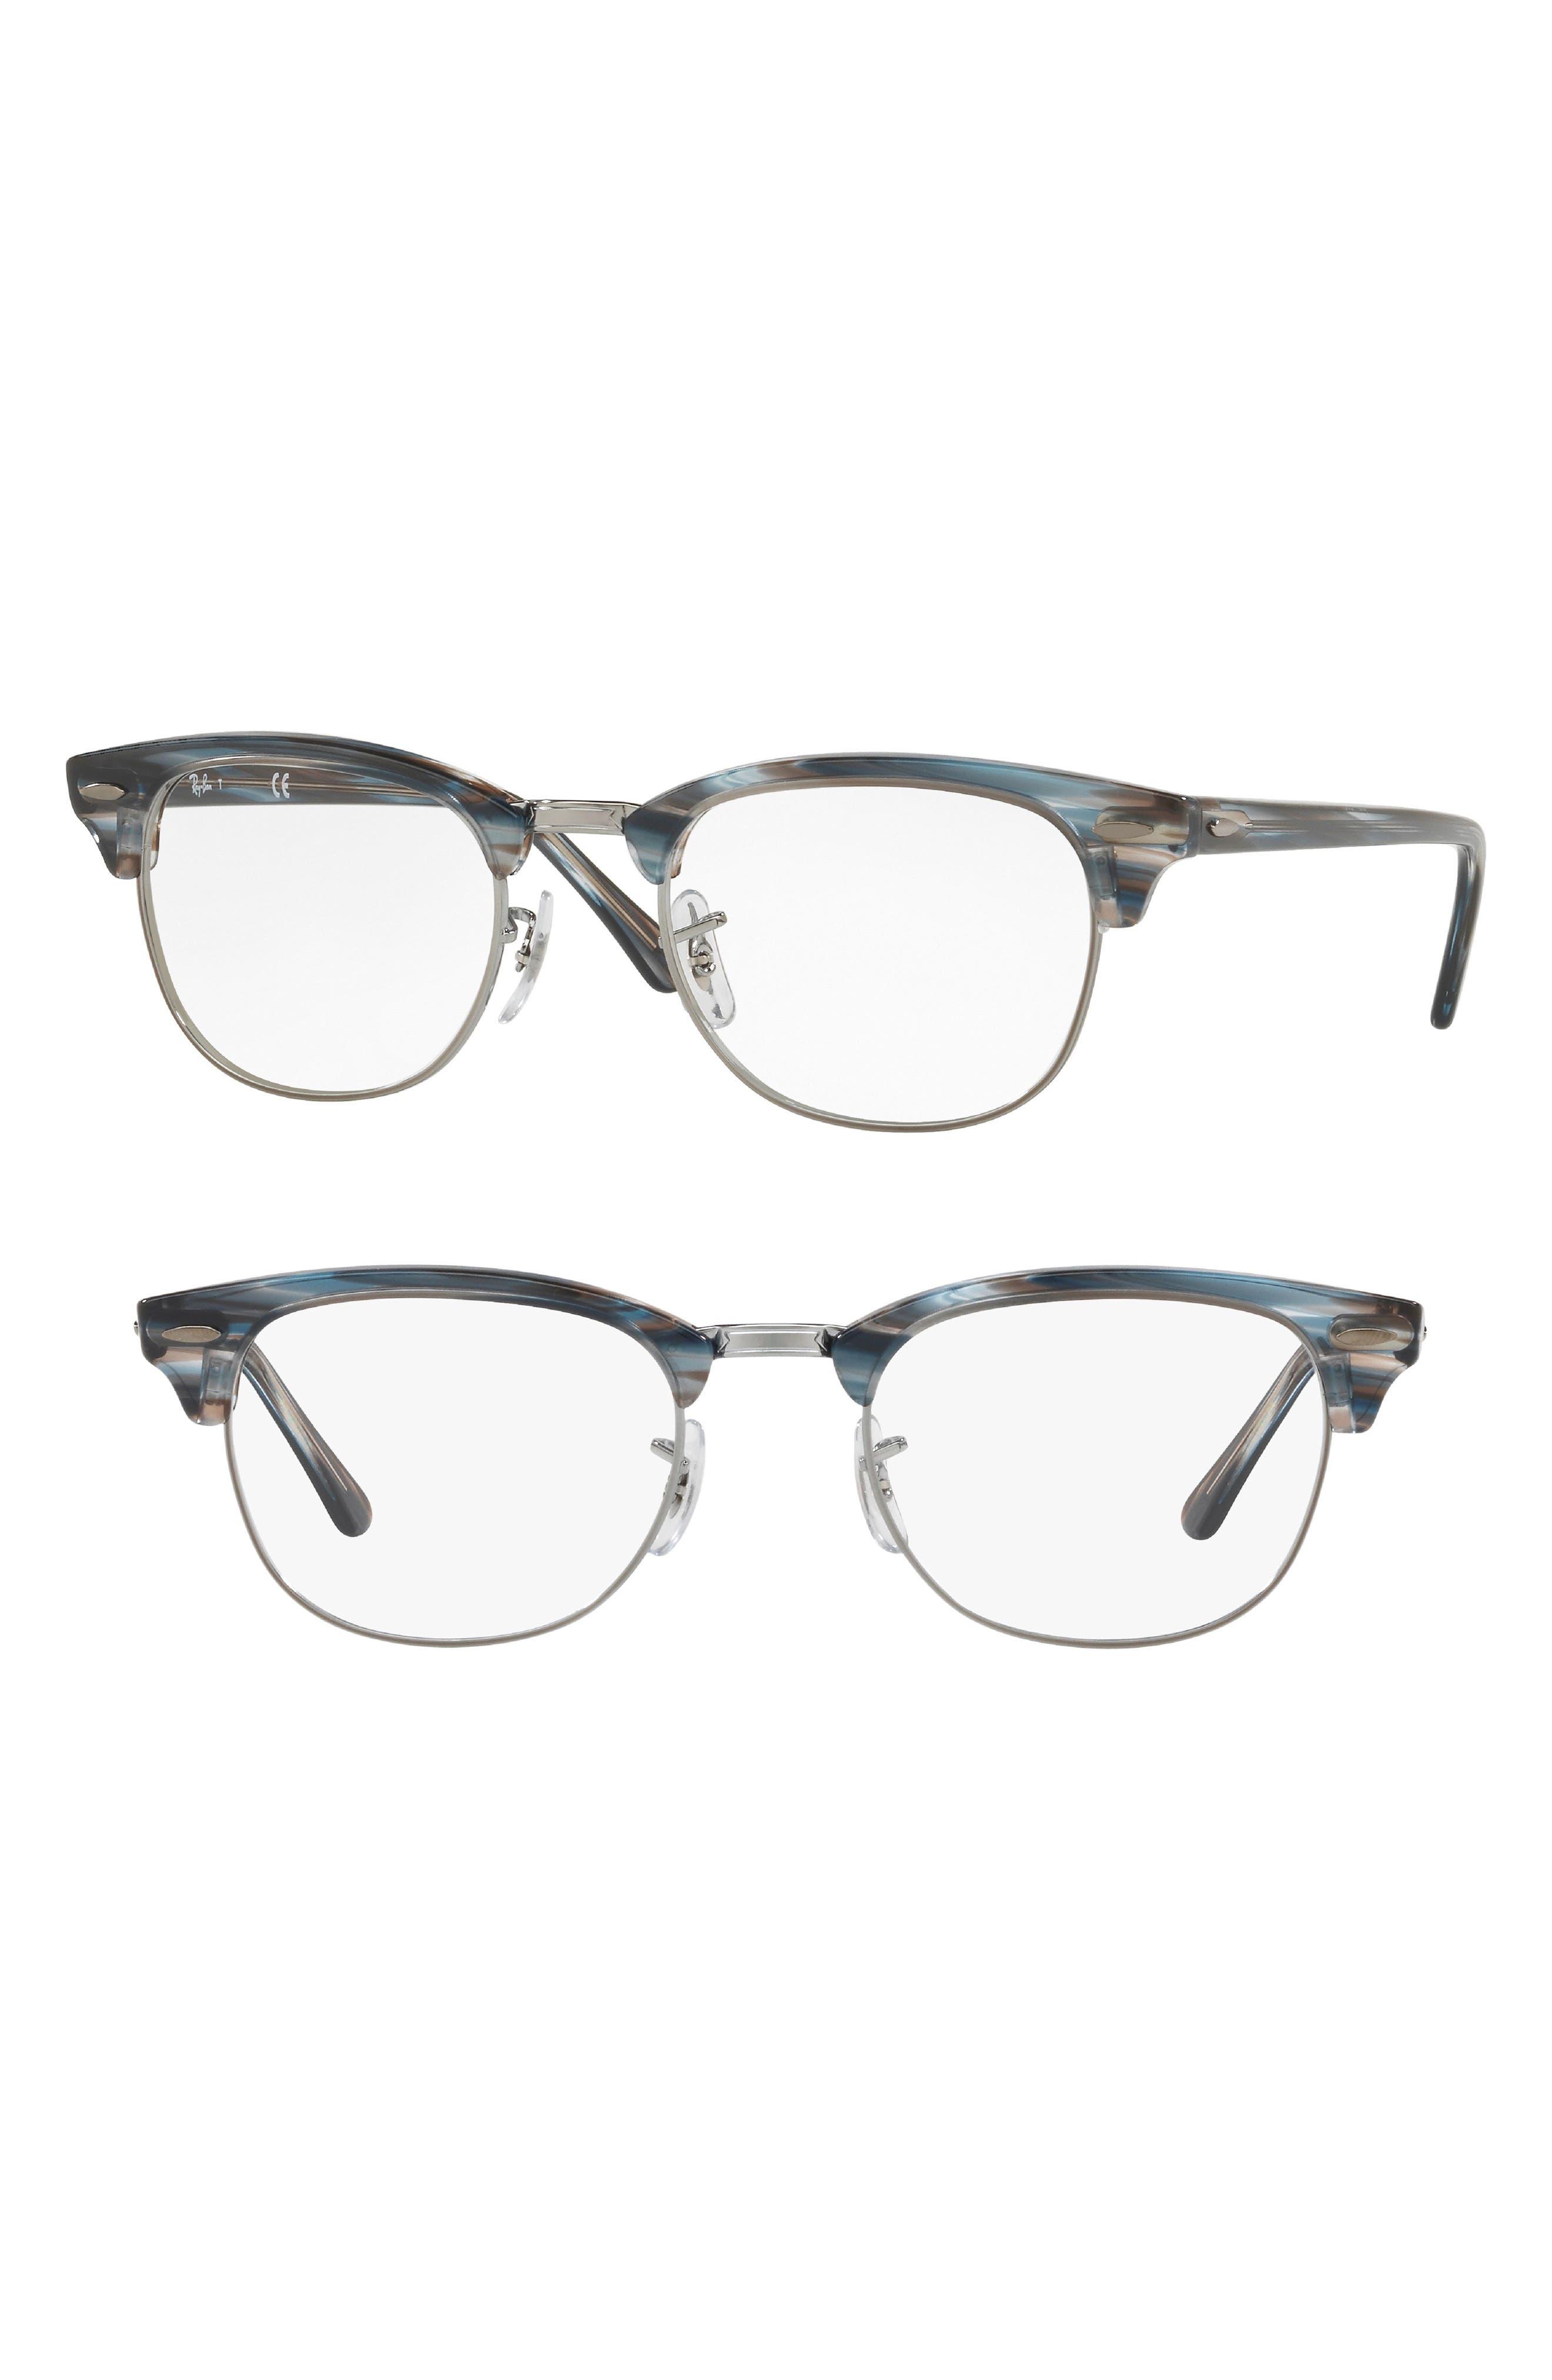 Ray-Ban 5154 51mm Optical Glasses